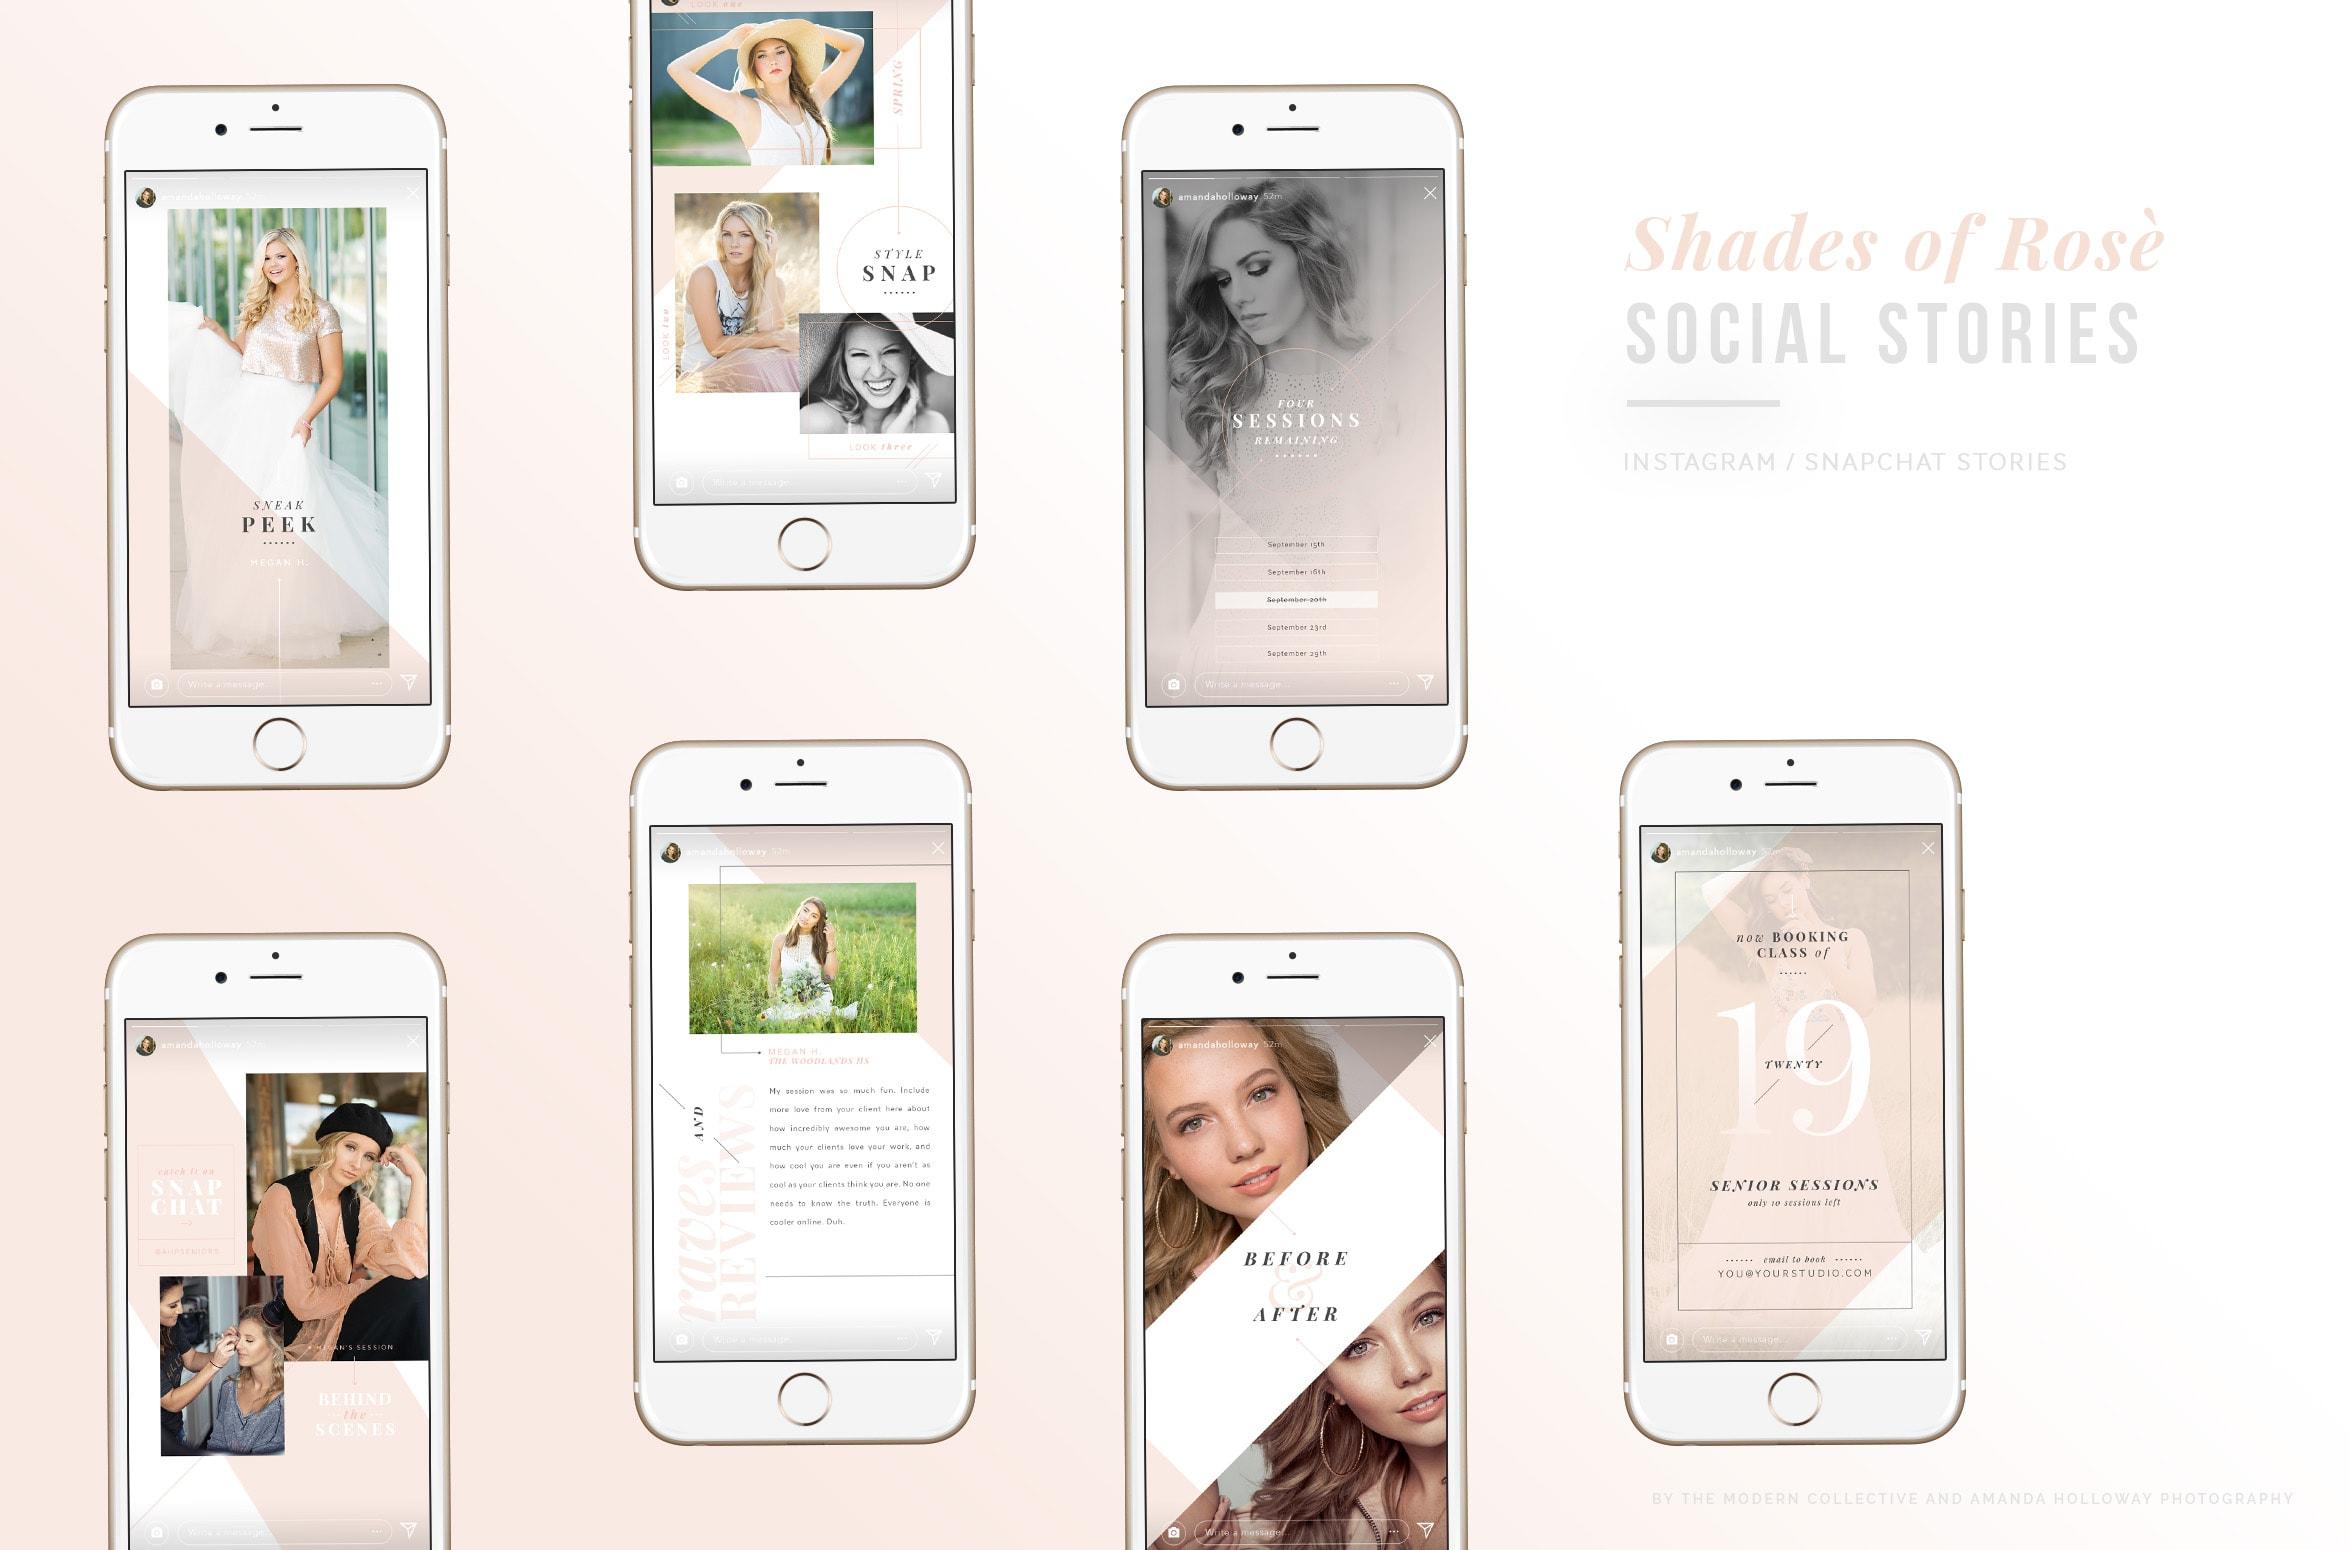 Shades of Rose: SOCIAL STORIES